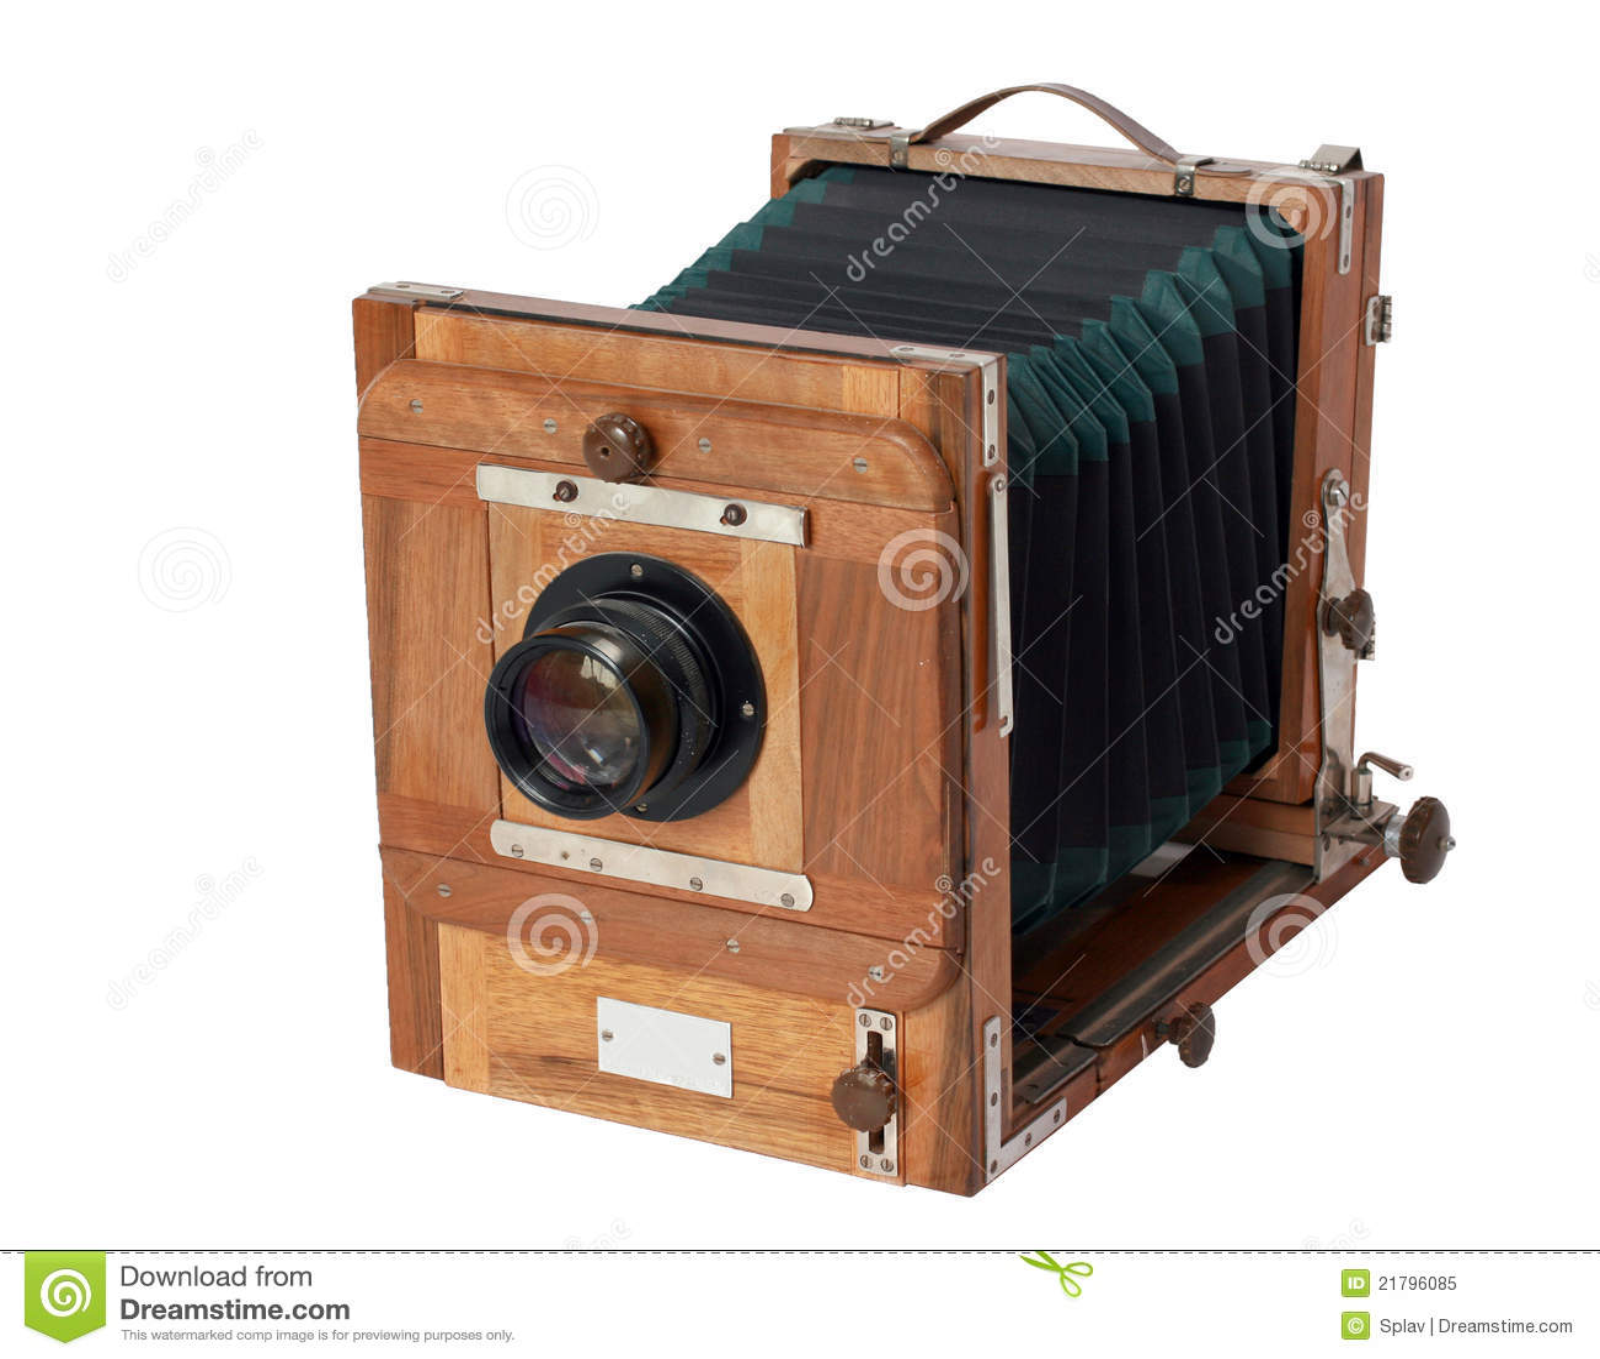 Camera royalty free stock photo image 21796085 for Camera gratis